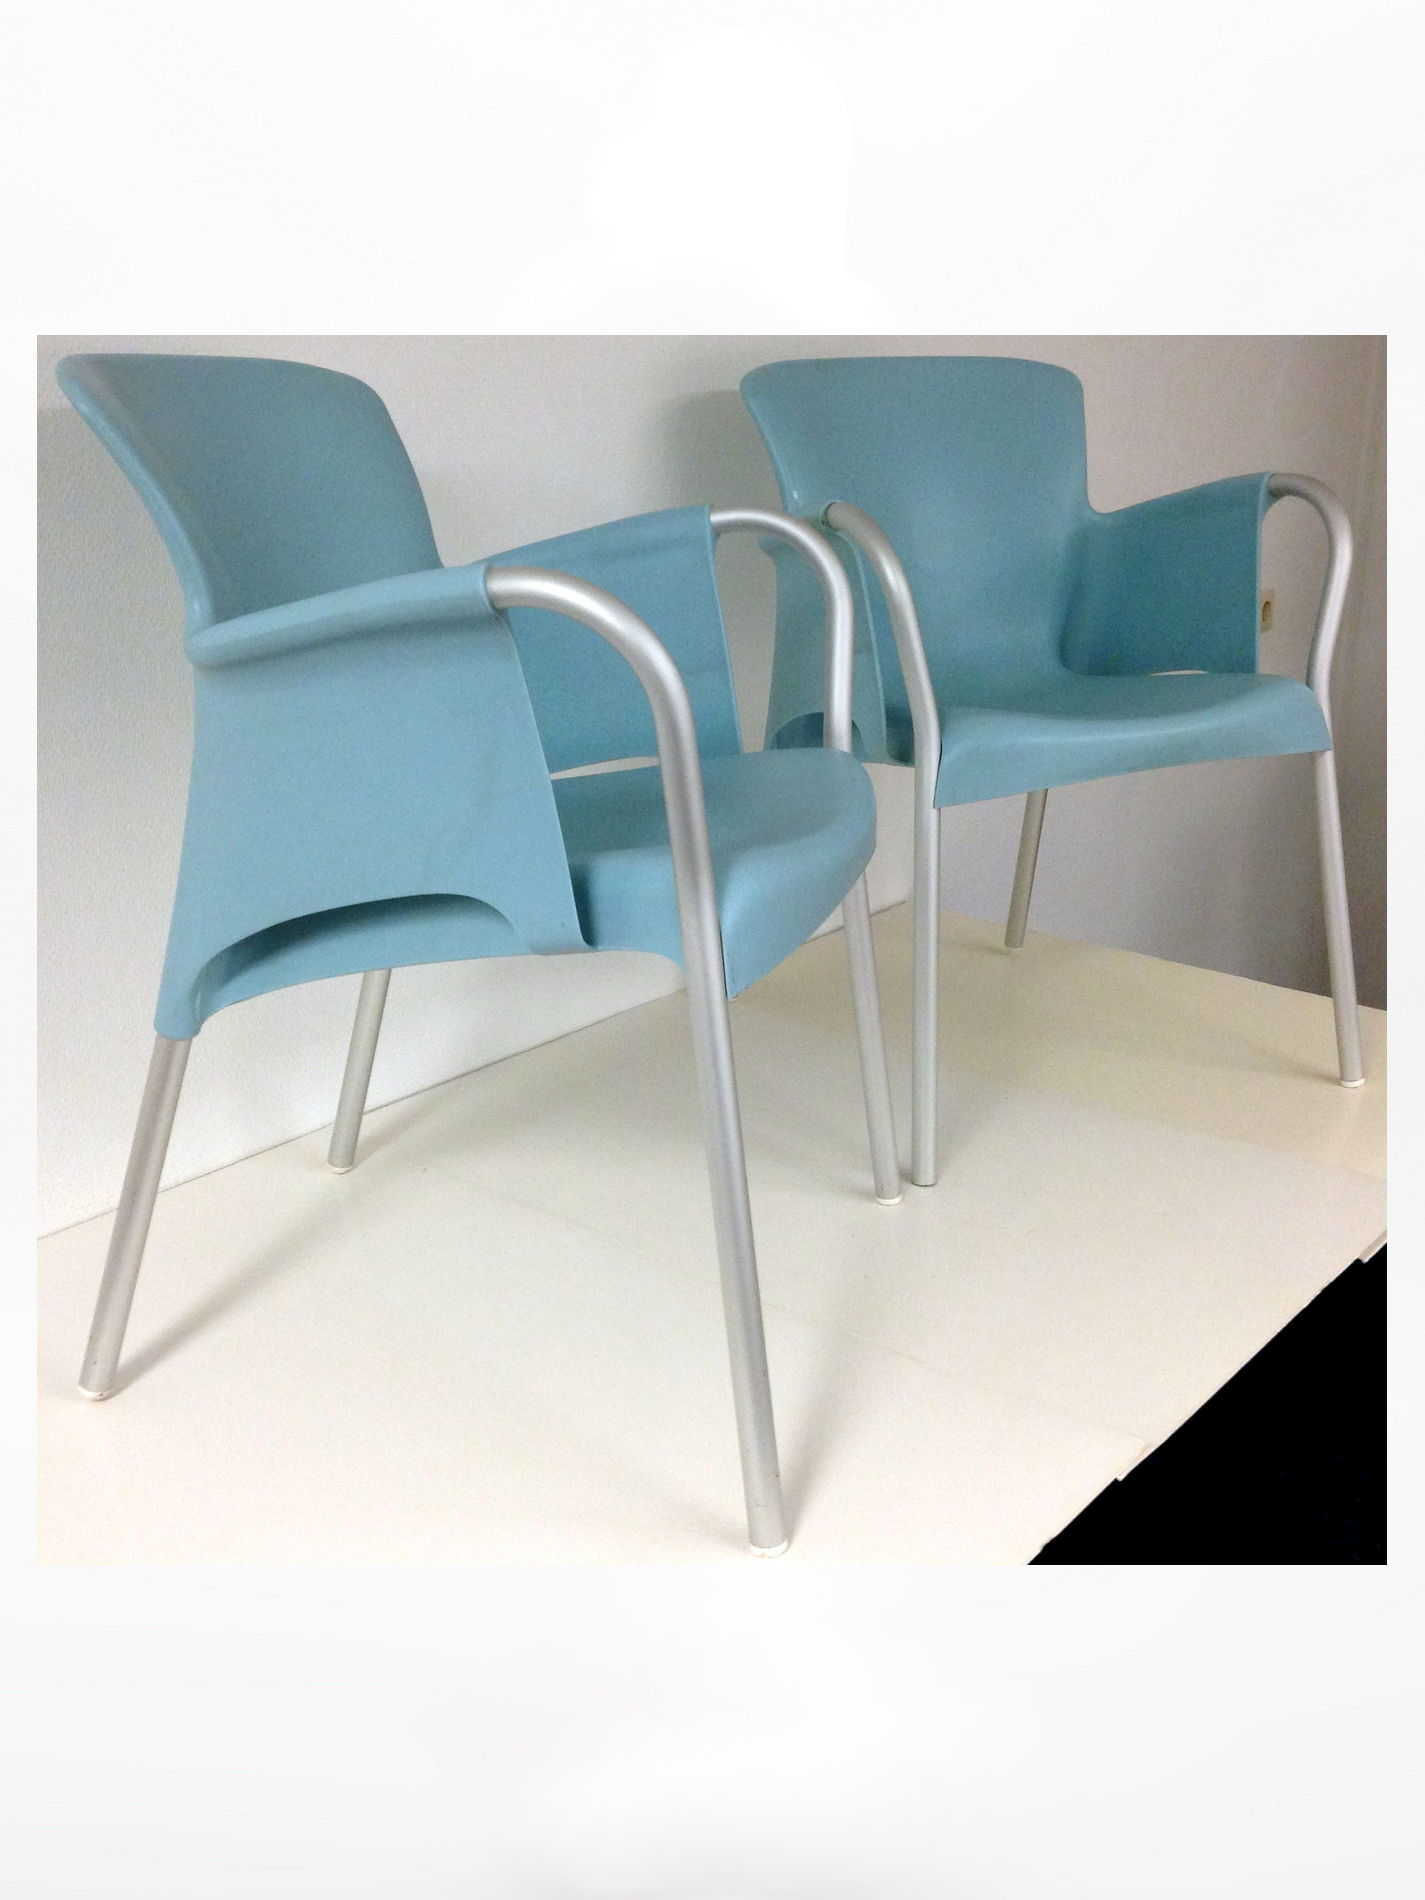 Design stapelstoel